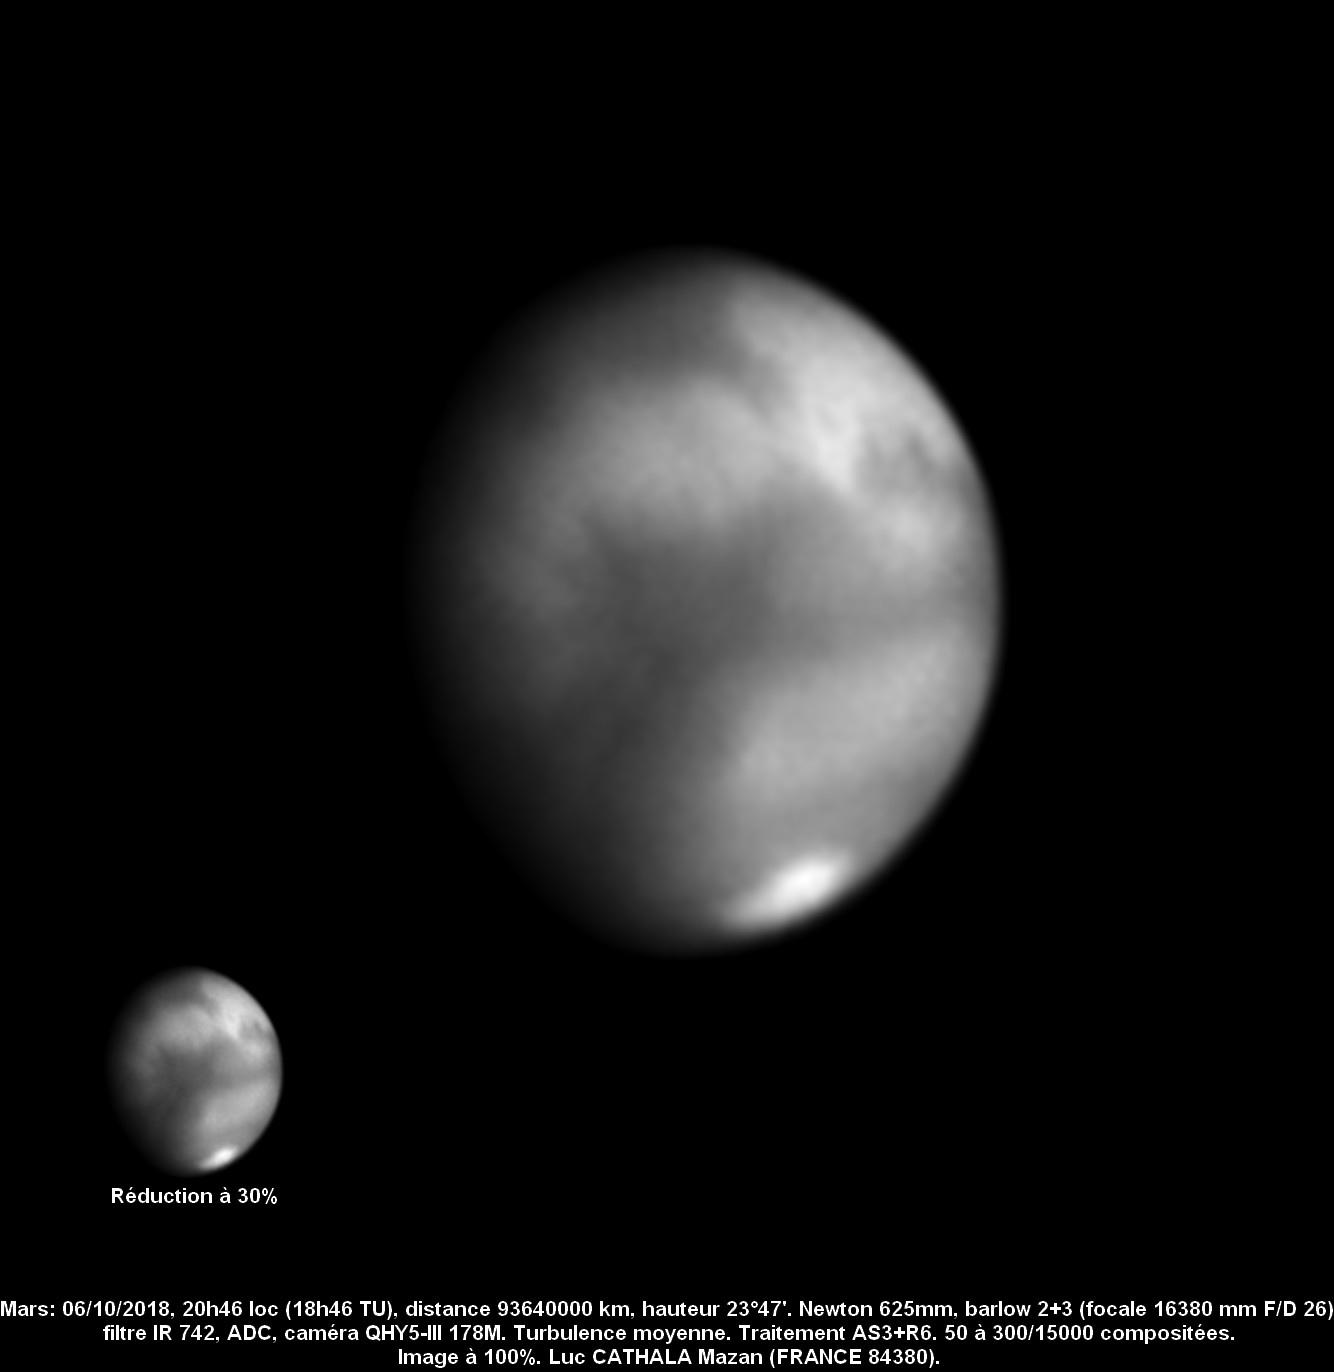 MARS ADC 625 B2+3 742 20_46_32_06_10_2018.jpg